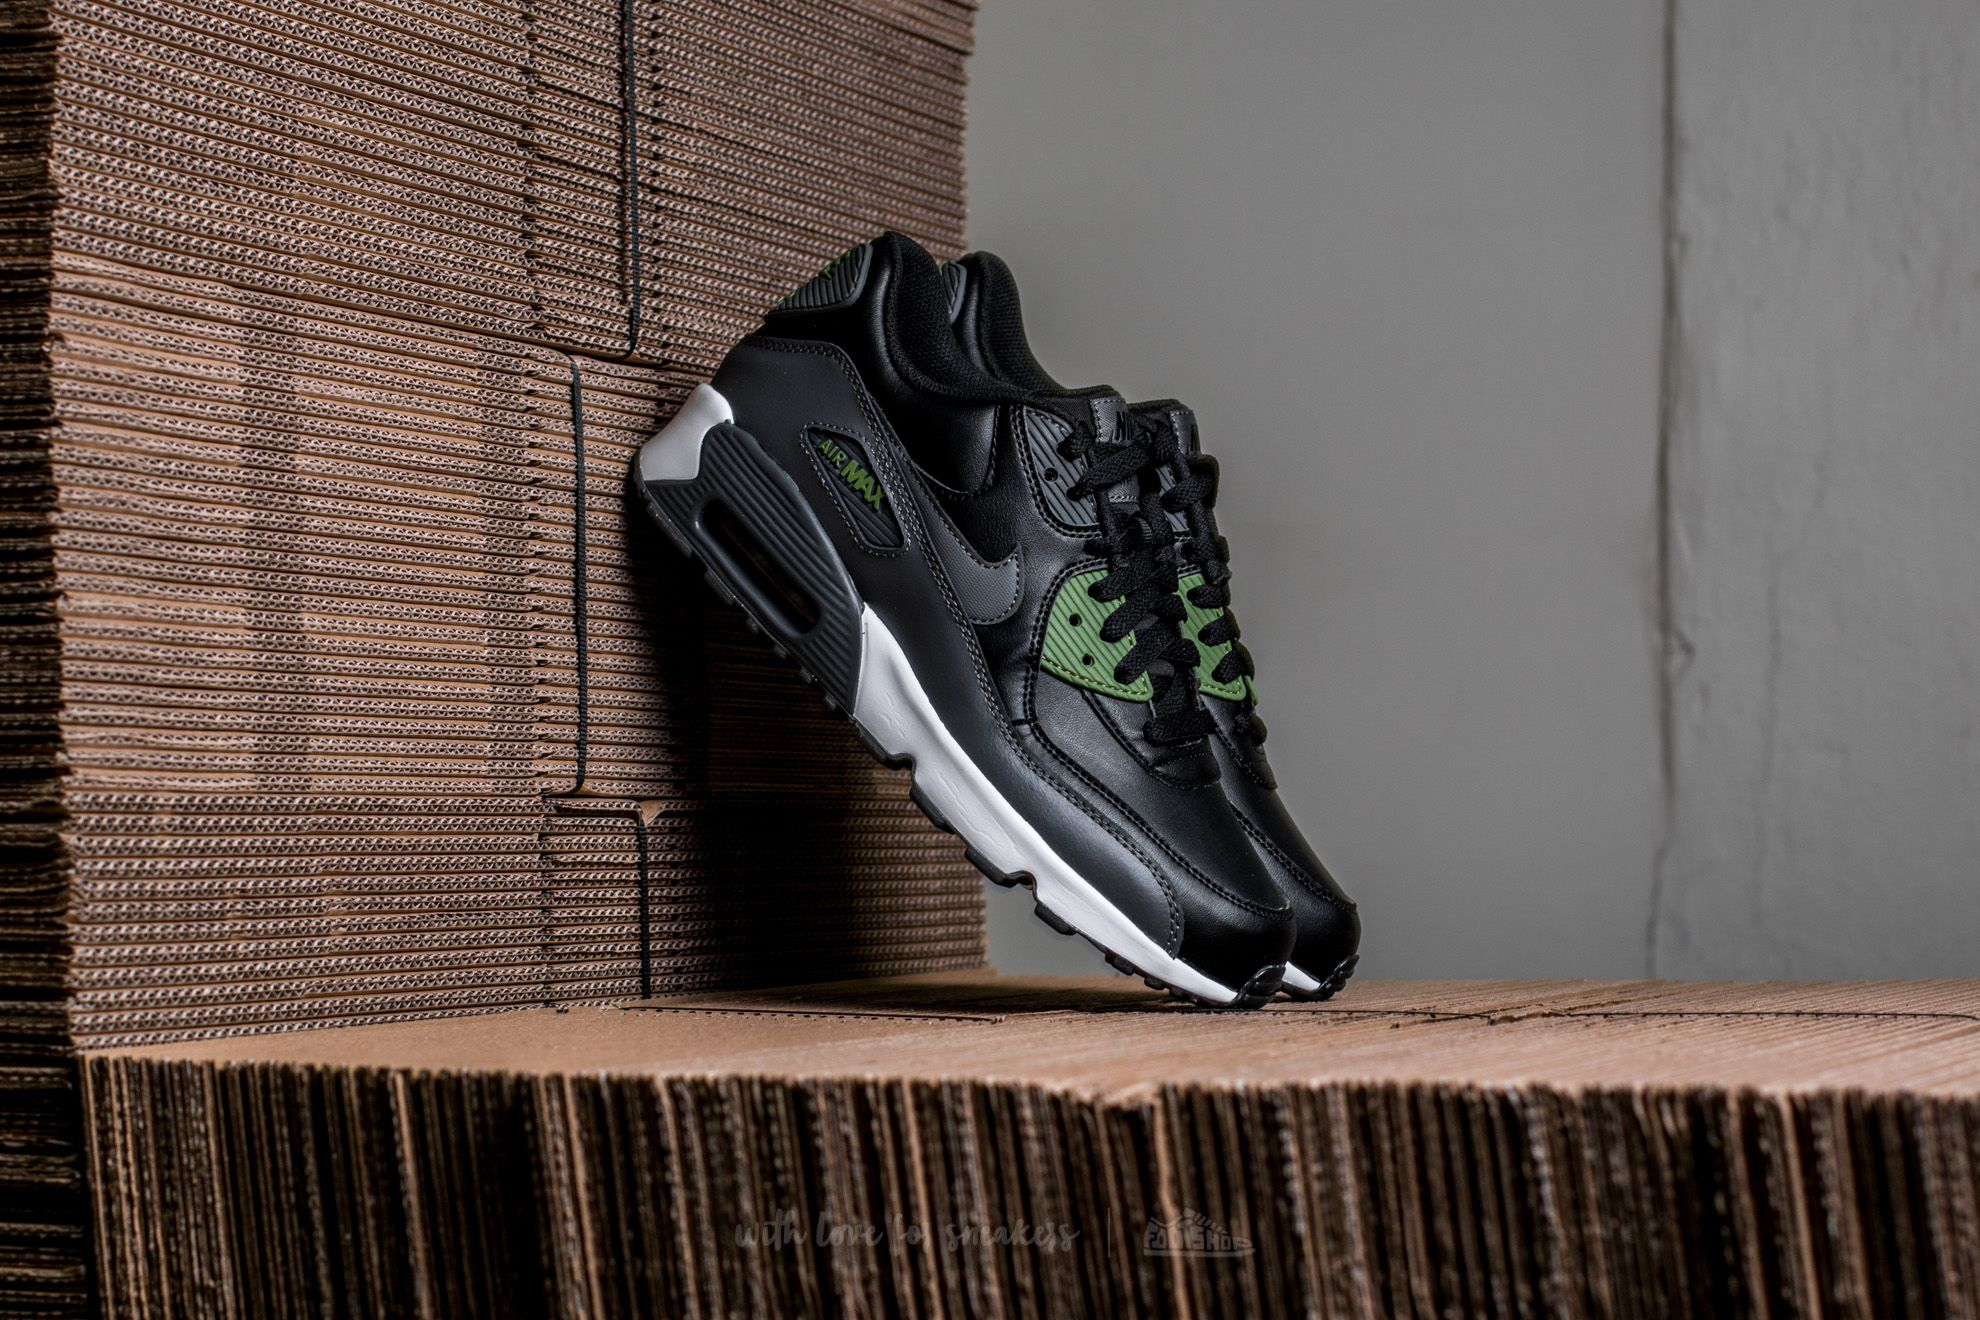 73736784e9 Nike Air Max 90 Leather (GS) Black/ Dark Grey-Palm Green   Footshop